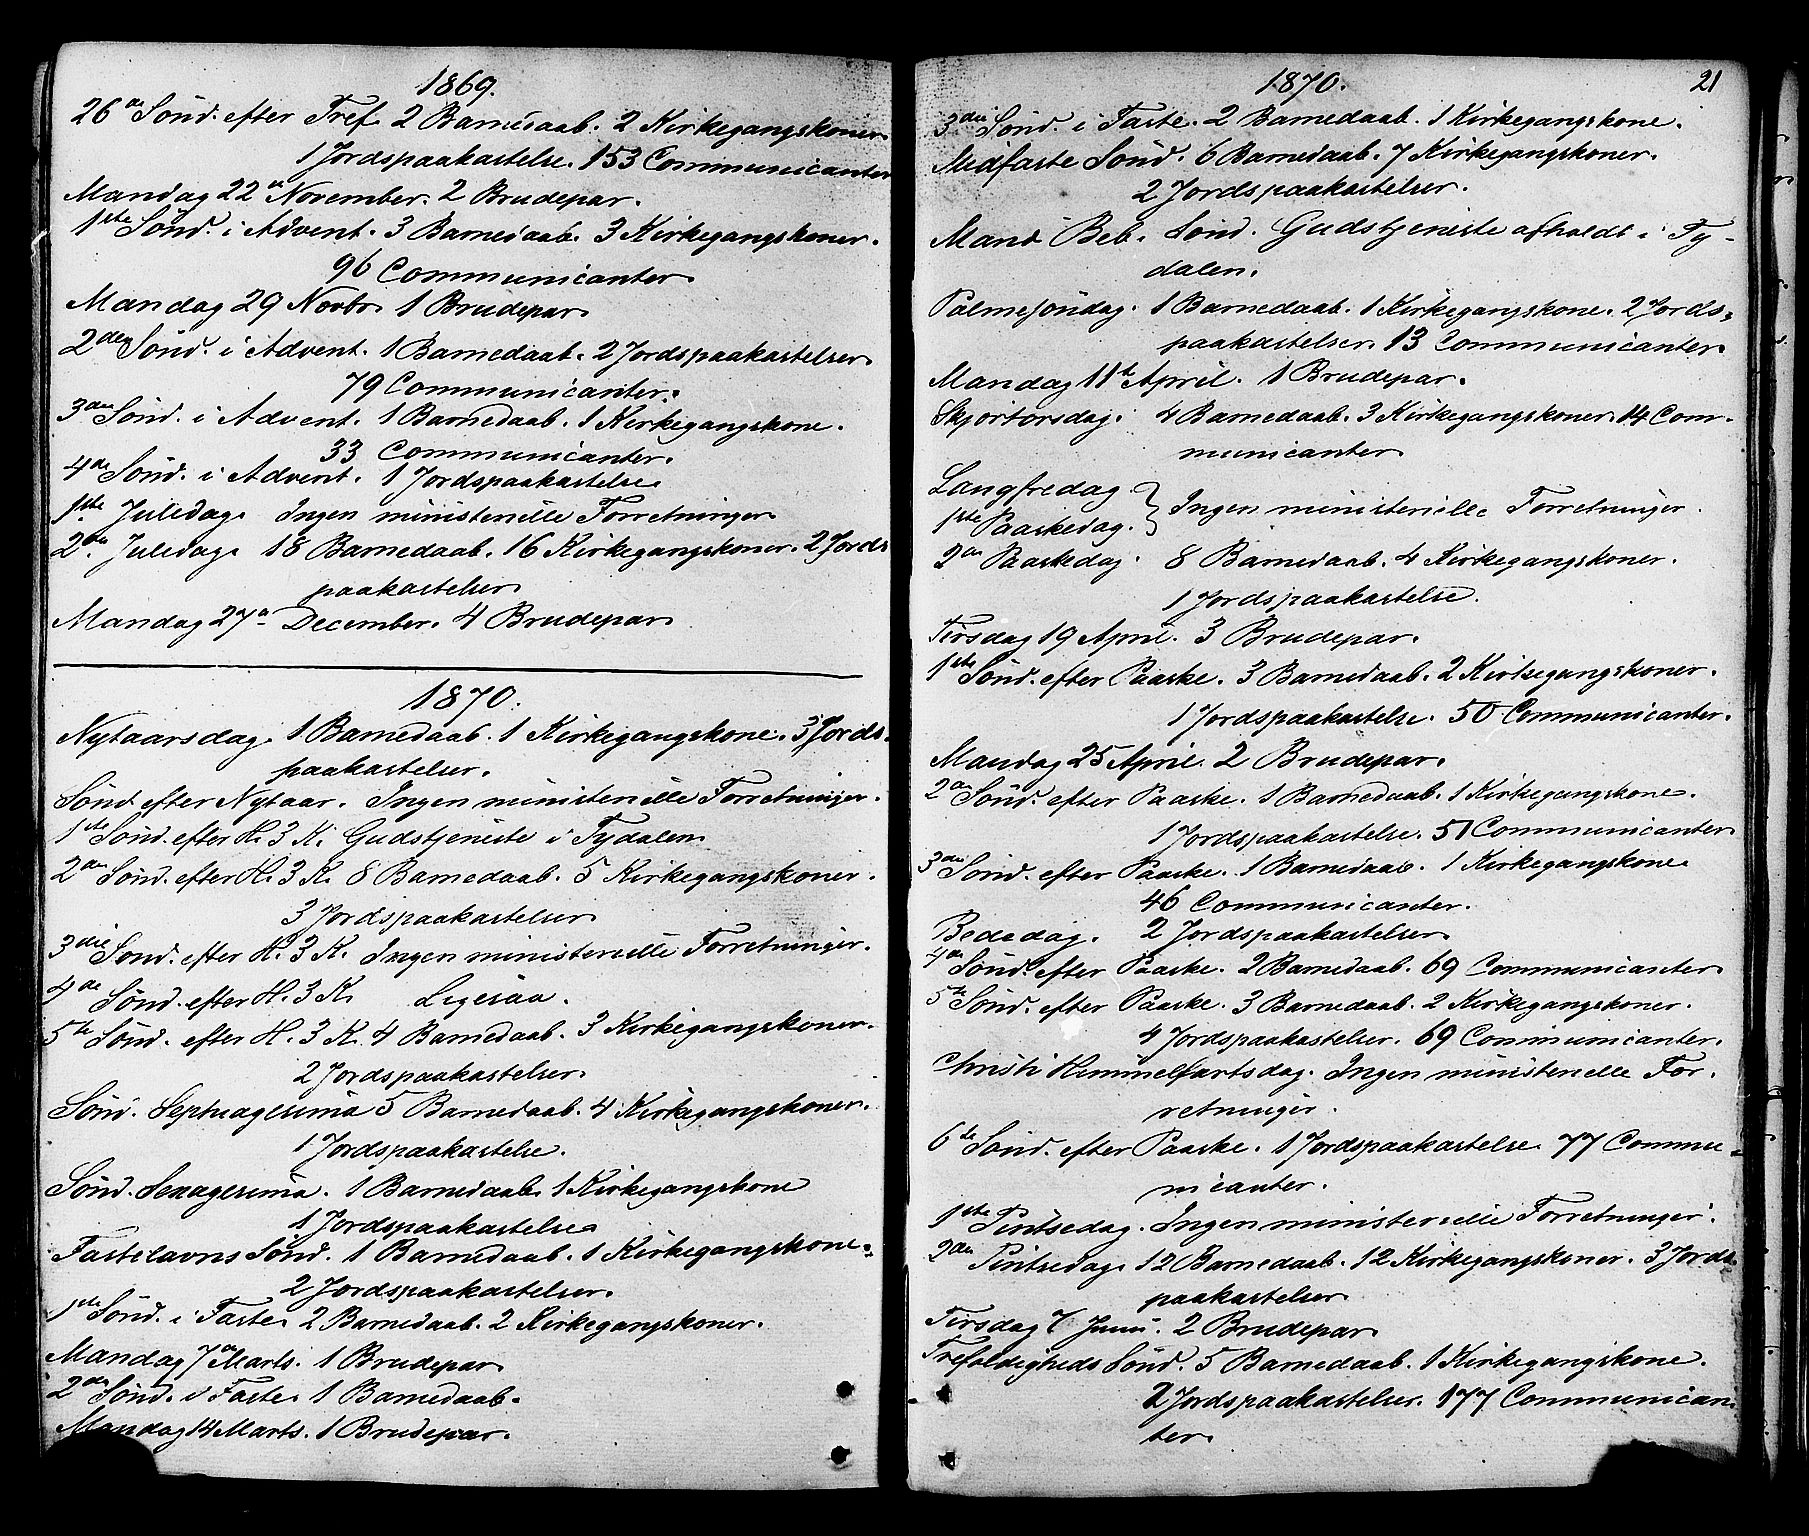 SAT, Ministerialprotokoller, klokkerbøker og fødselsregistre - Sør-Trøndelag, 695/L1147: Parish register (official) no. 695A07, 1860-1877, p. 21